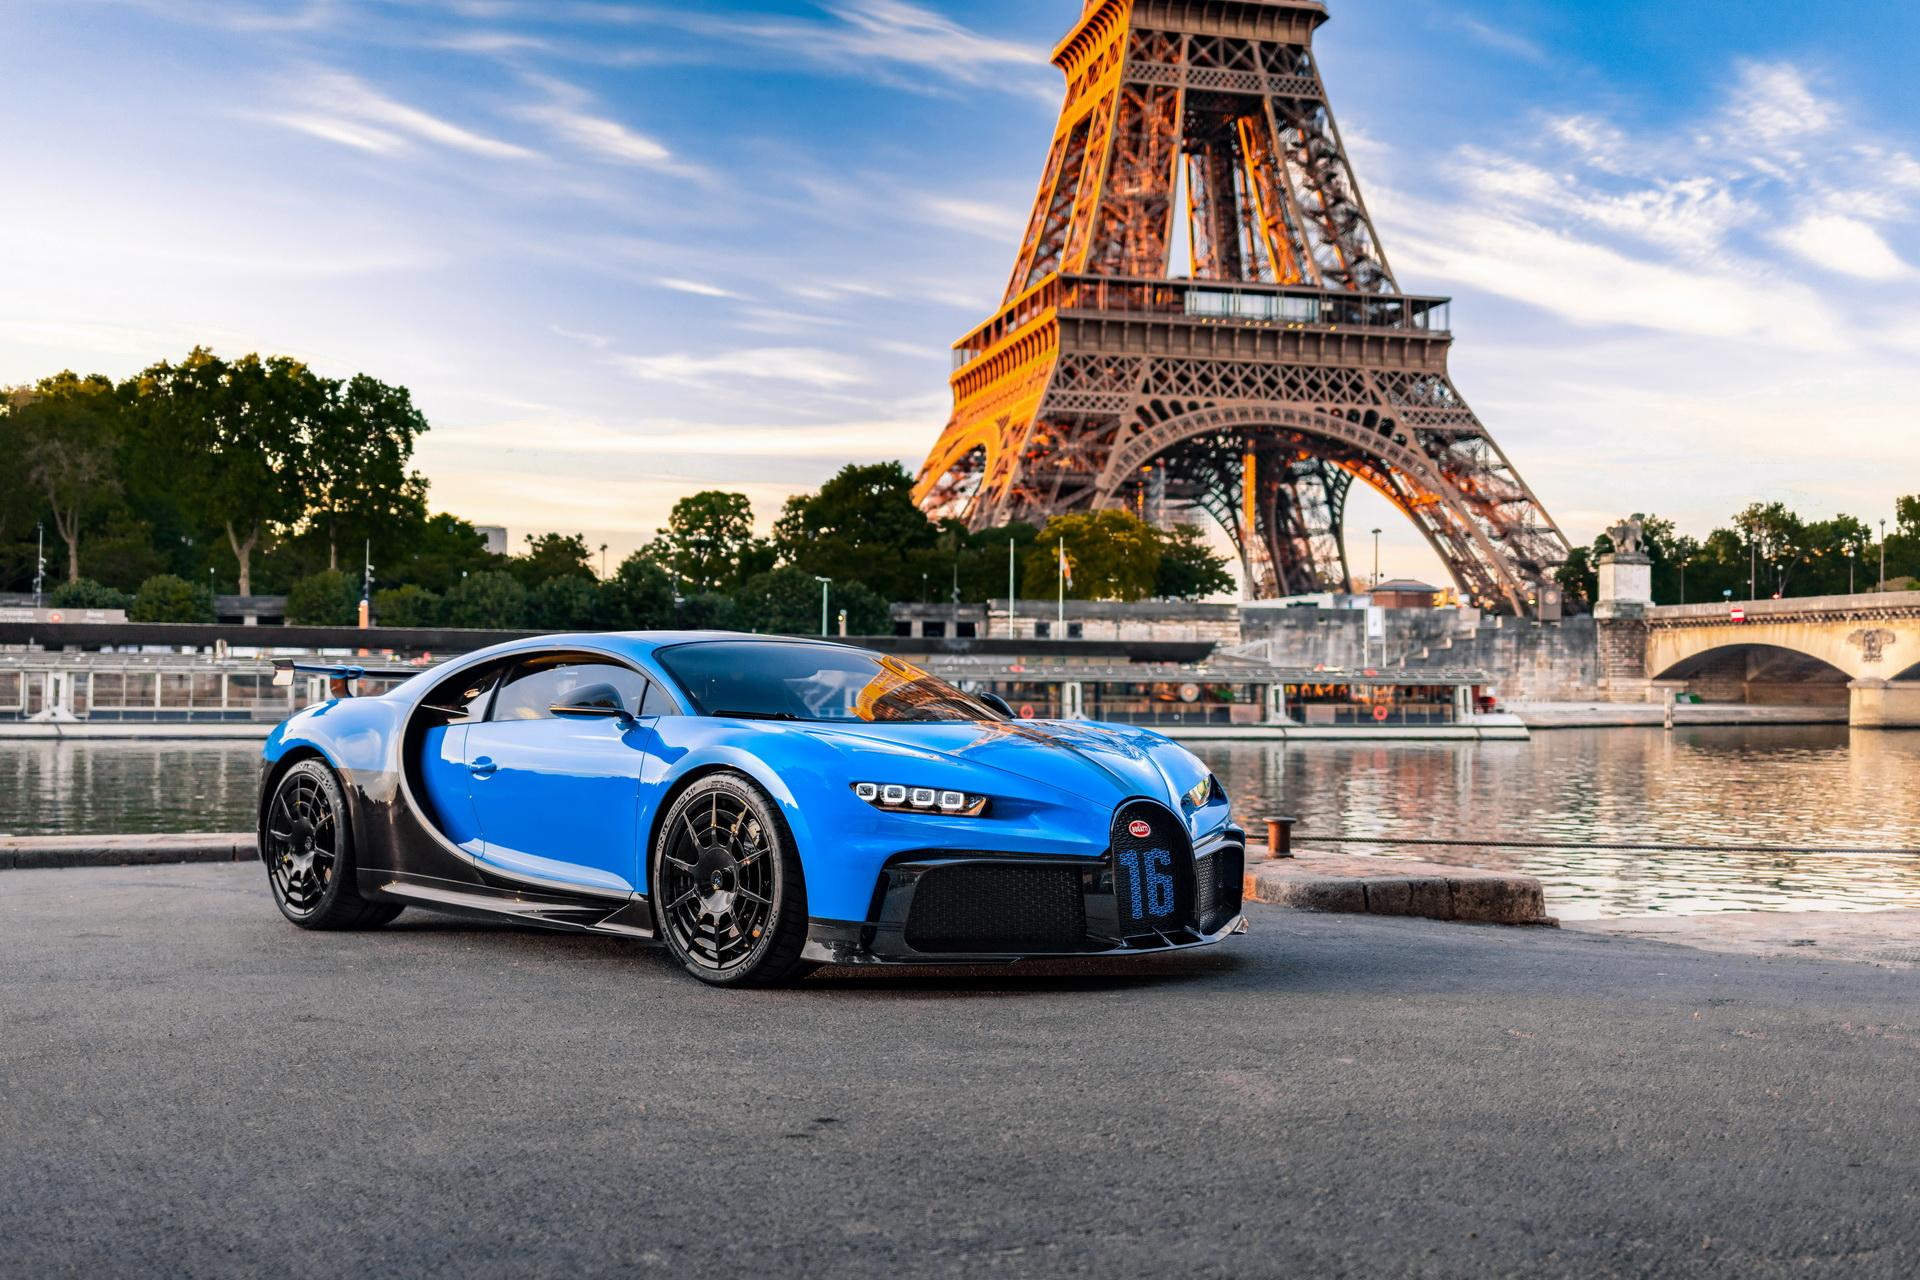 Bugatti_Chiron_Pur_Sport_road_trip_0000